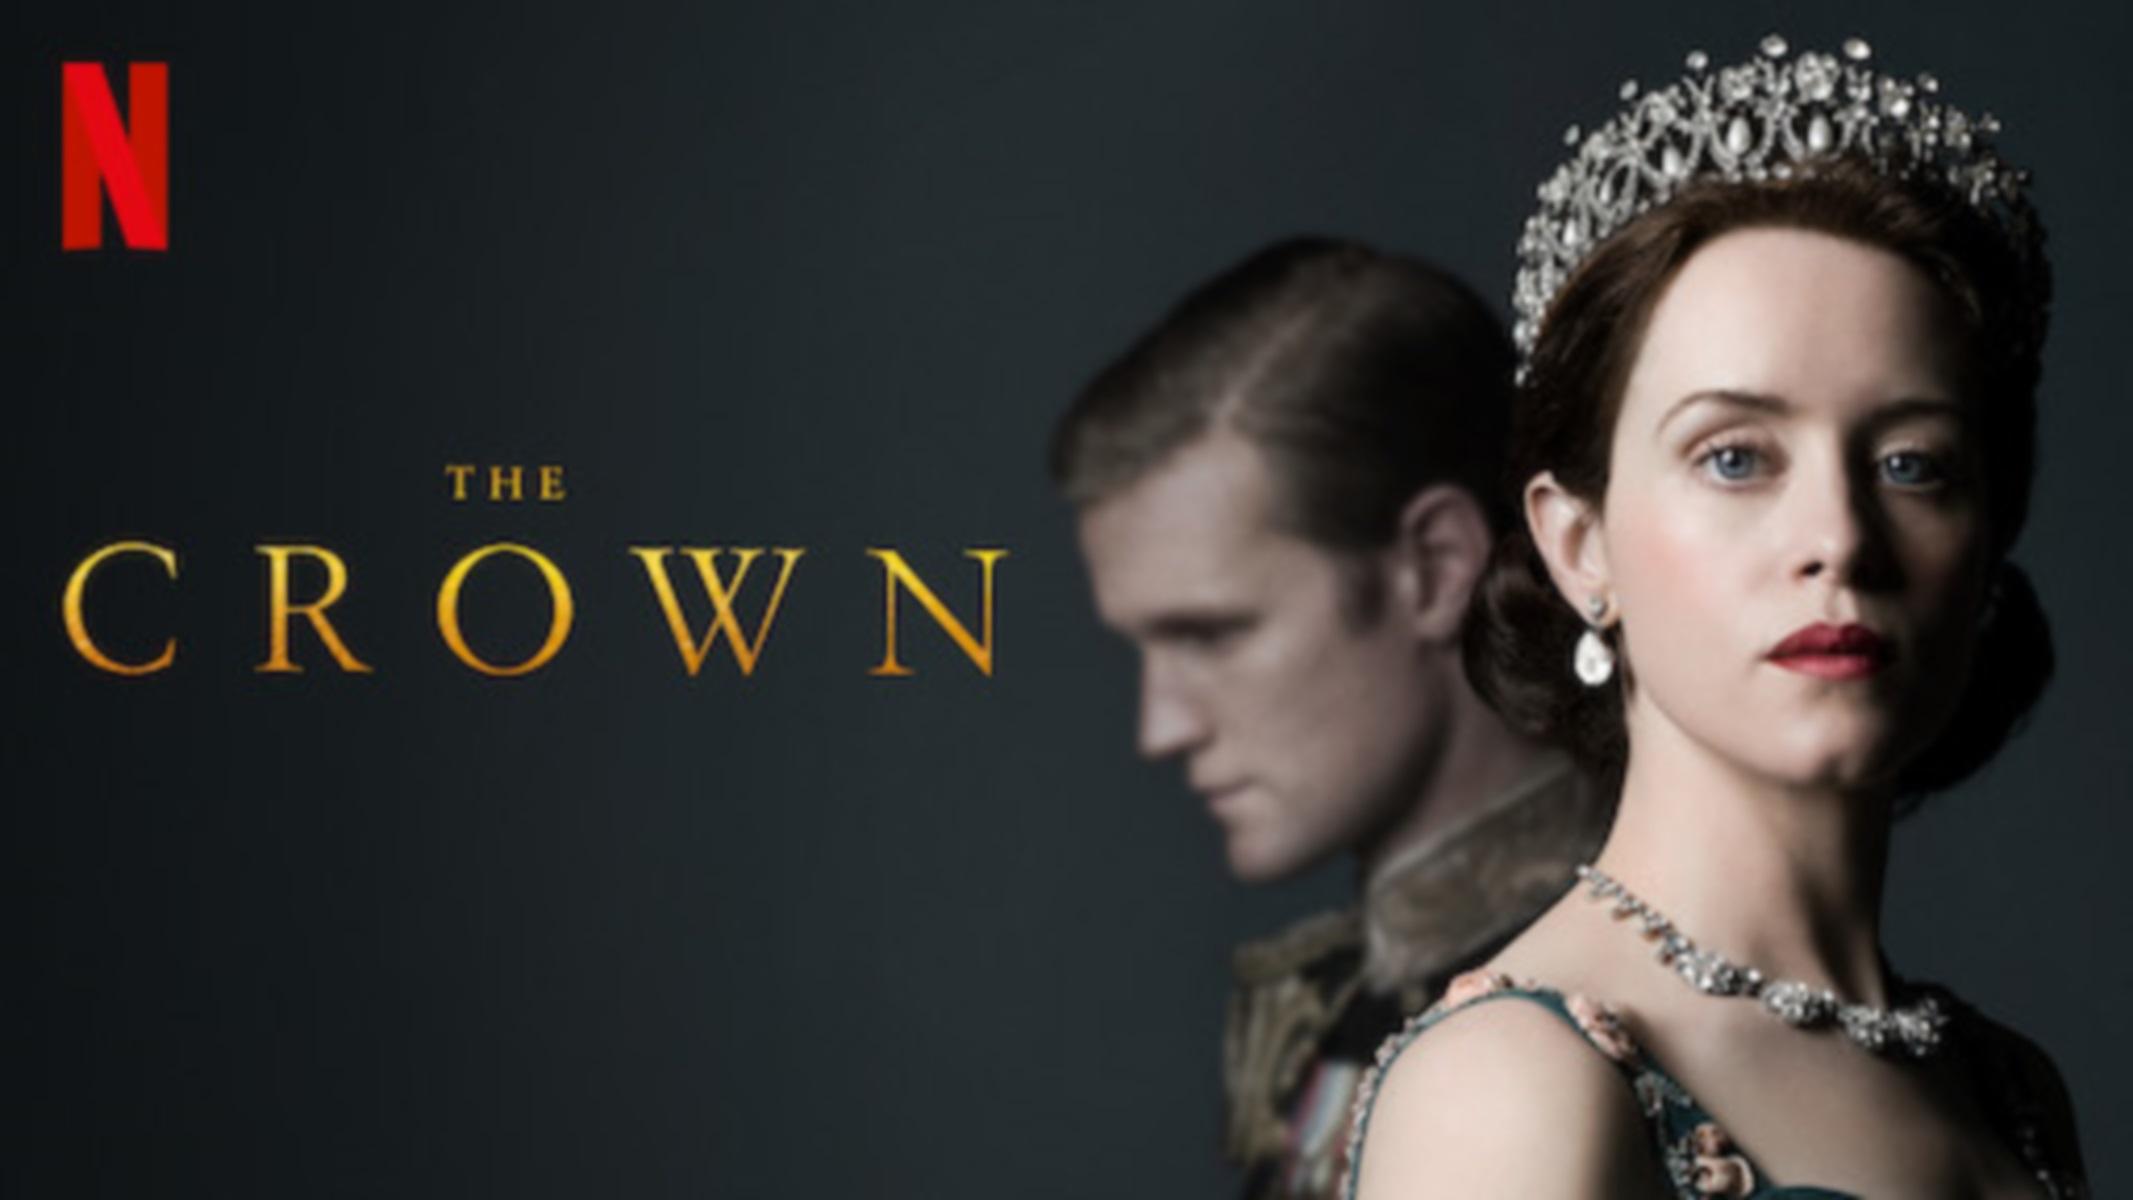 The Crown: Πότε θα προβληθεί στο Netflix η 5η σεζόν